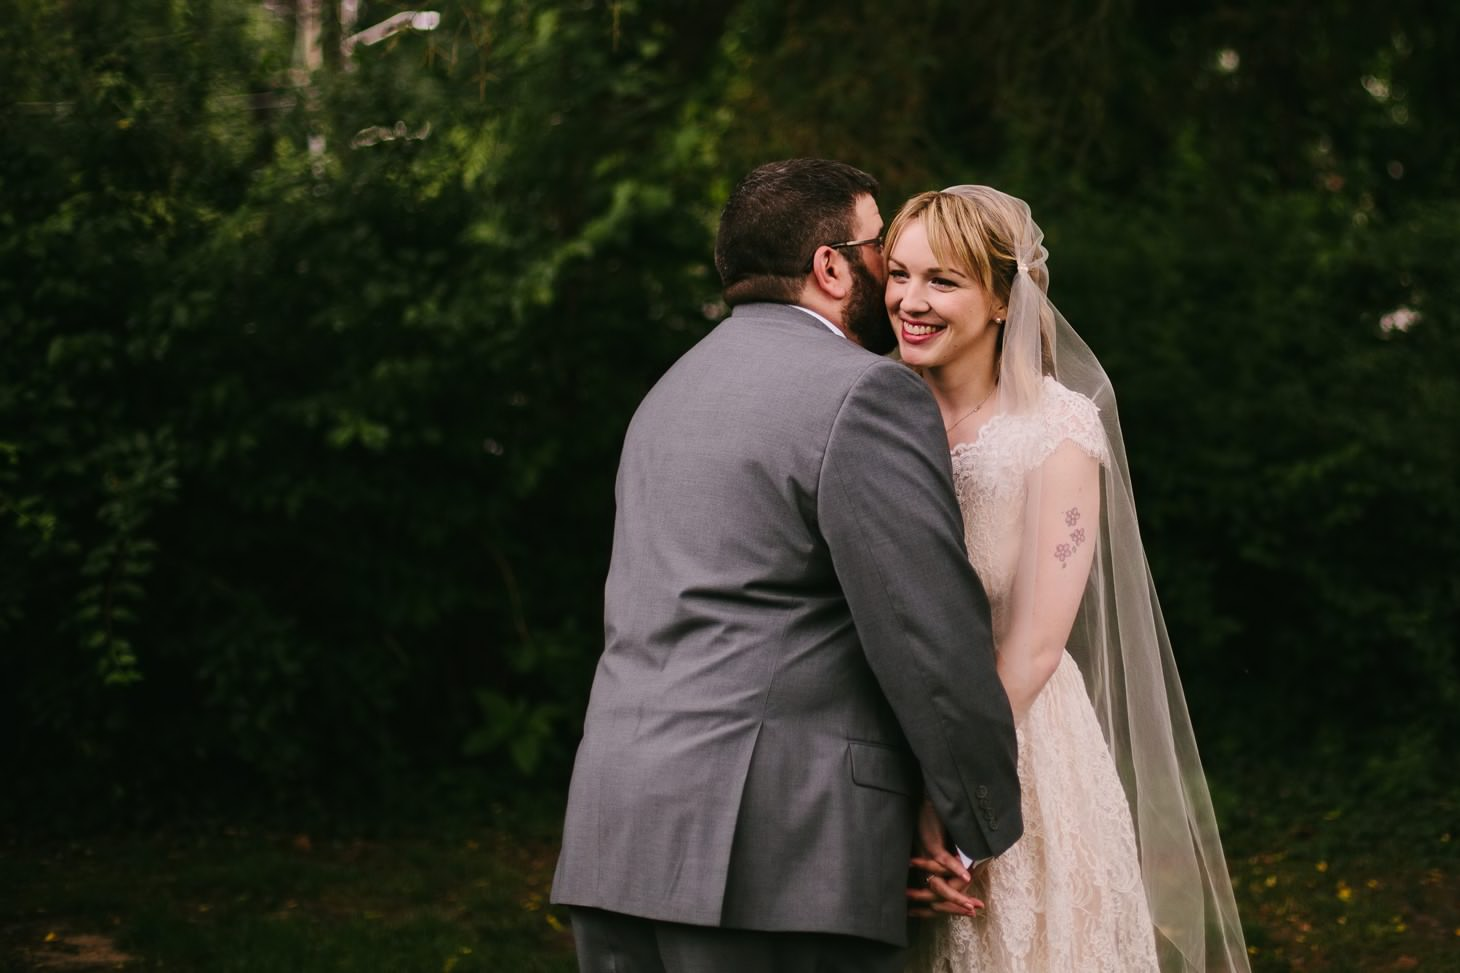 nyc-wedding-photographer-brooklyn-bridge-smitten-chickens-rainy-emotional-wedding-004.jpg